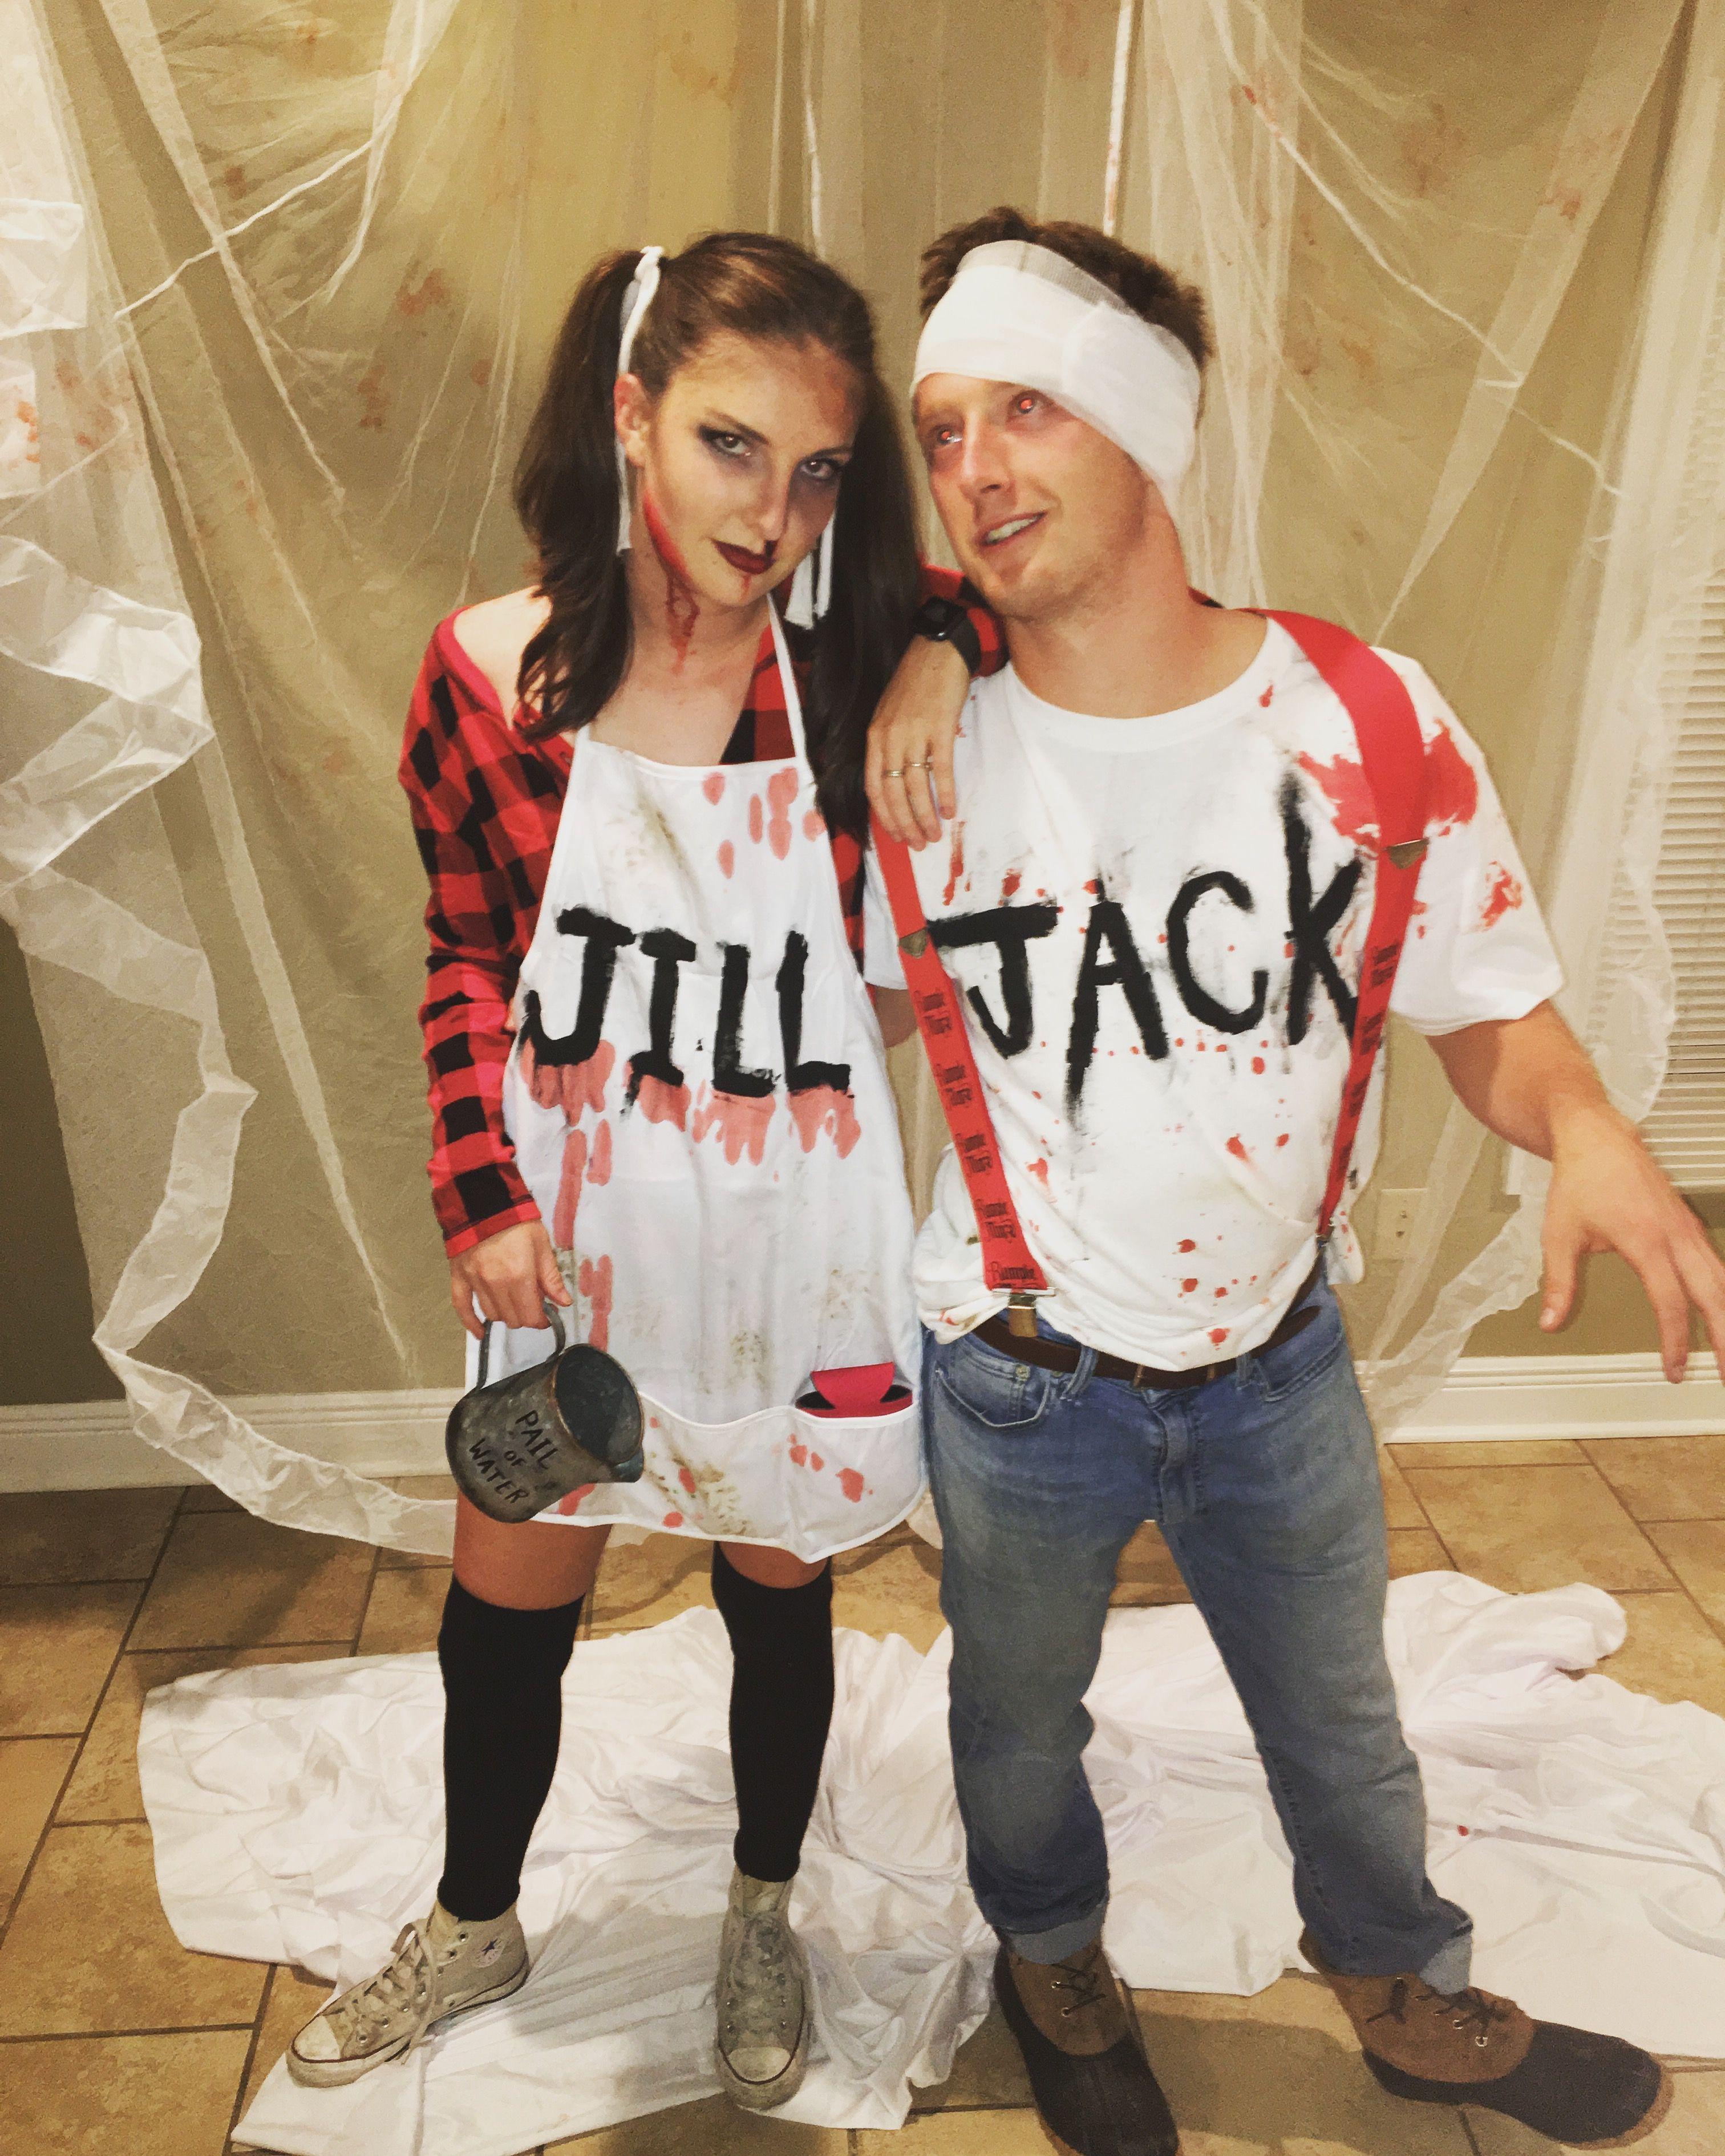 Jack and jill nursery rhyme Halloween costume scary couple